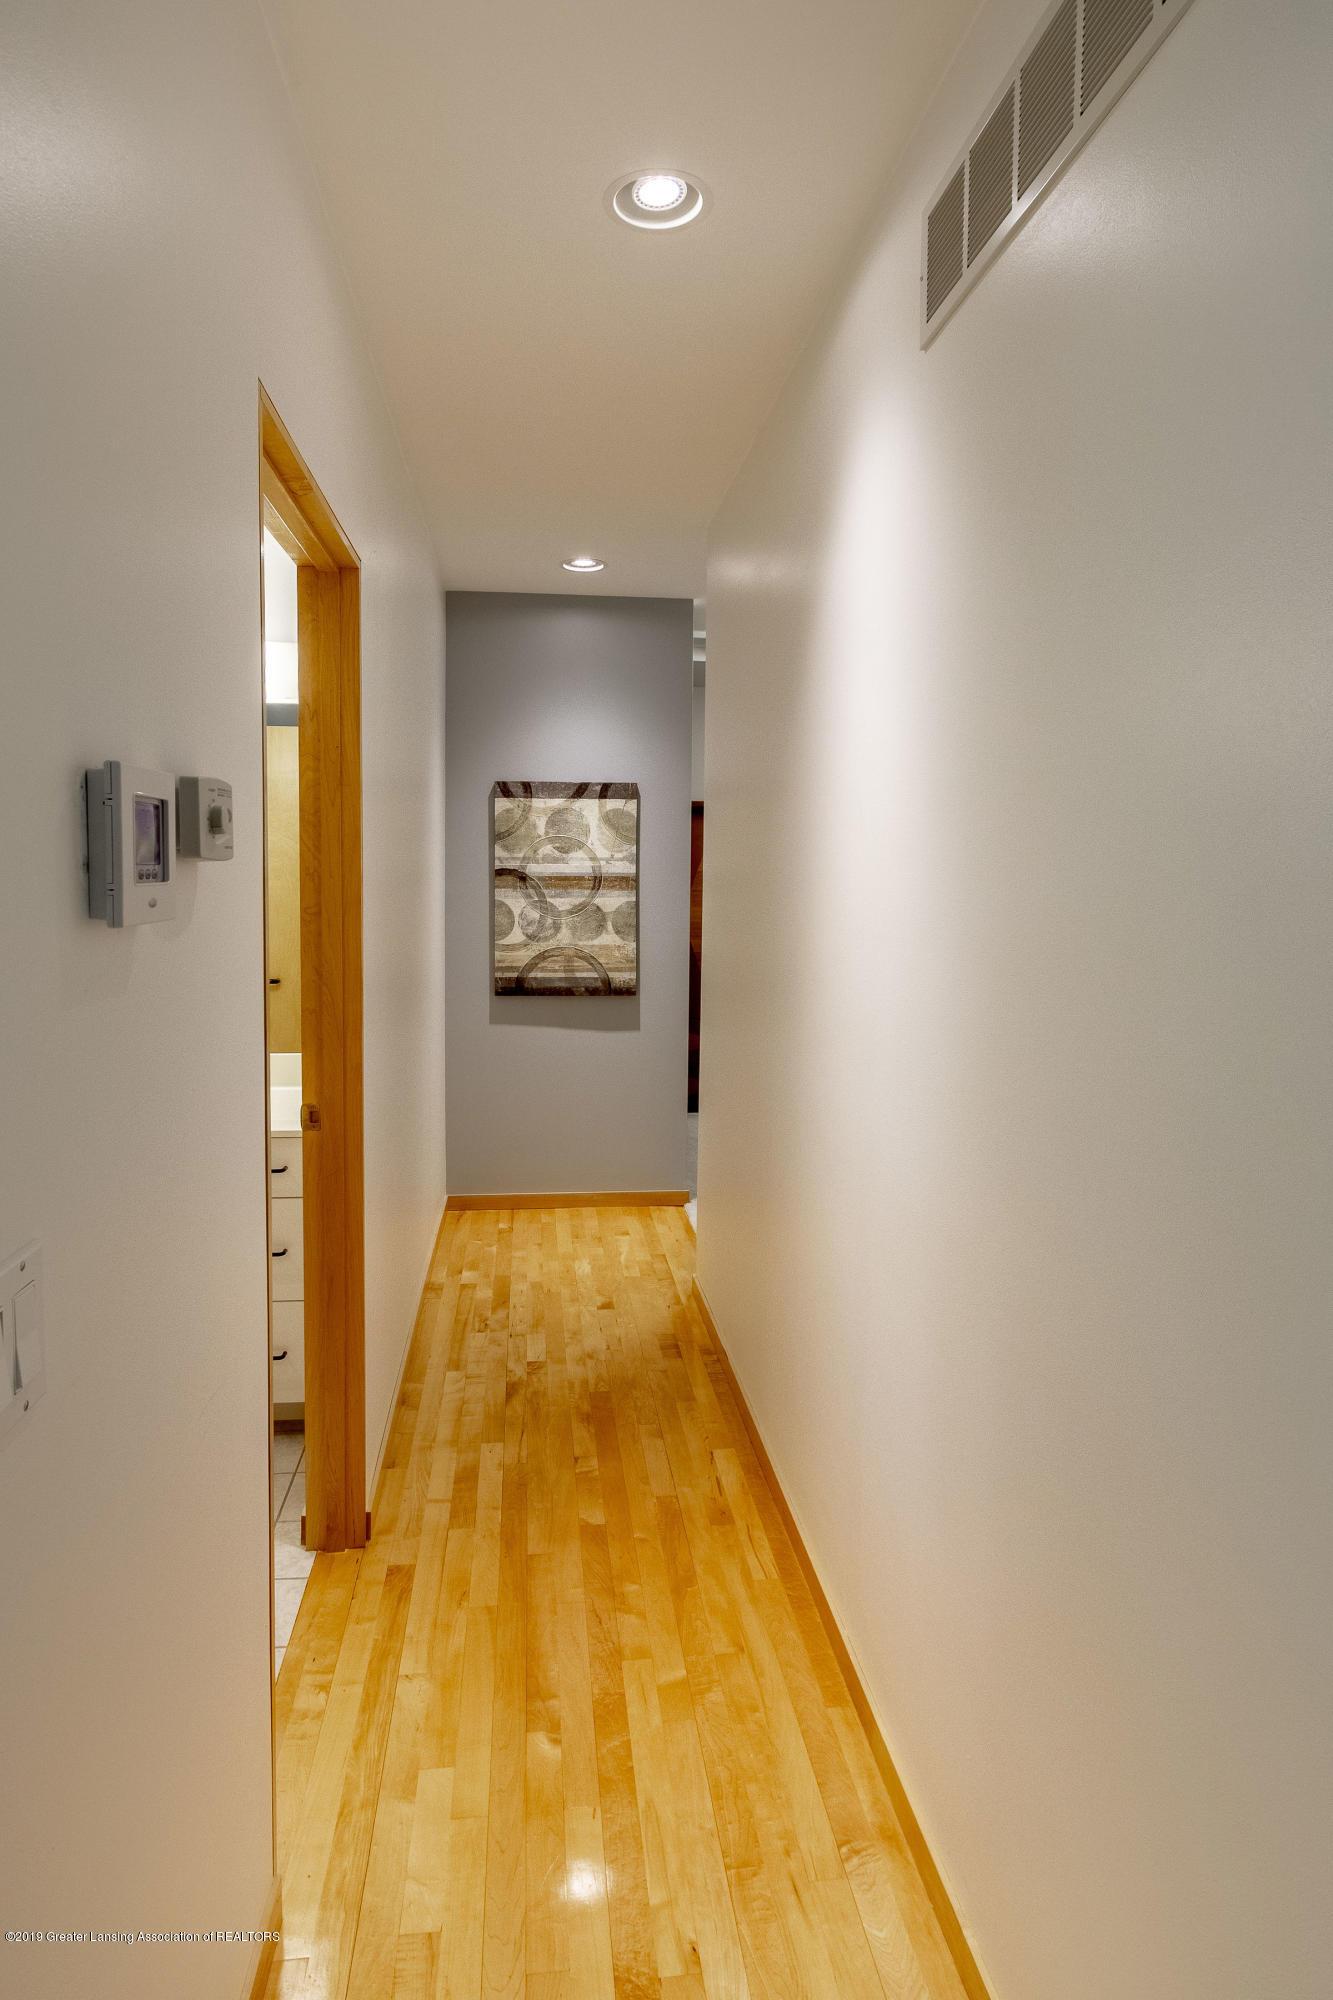 4435 Oak Pointe Ct - Hallway to Bedrooms - 62